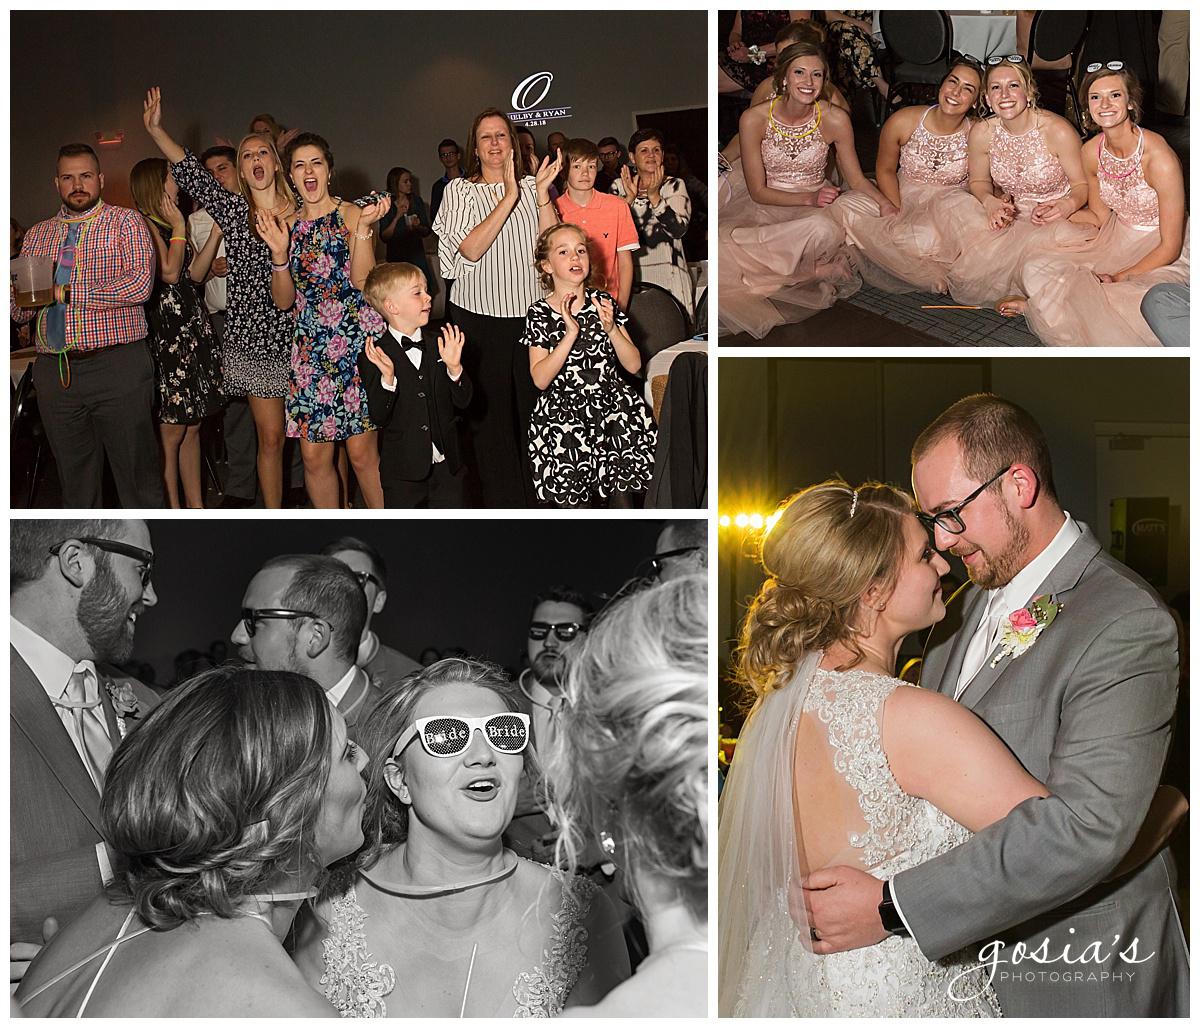 Gosias-Photography-Appleton-wedding-photographer-Fond-du-Lac-ceremony-Holiday-Inn-reception-Shelby-Ryan-_0034.jpg